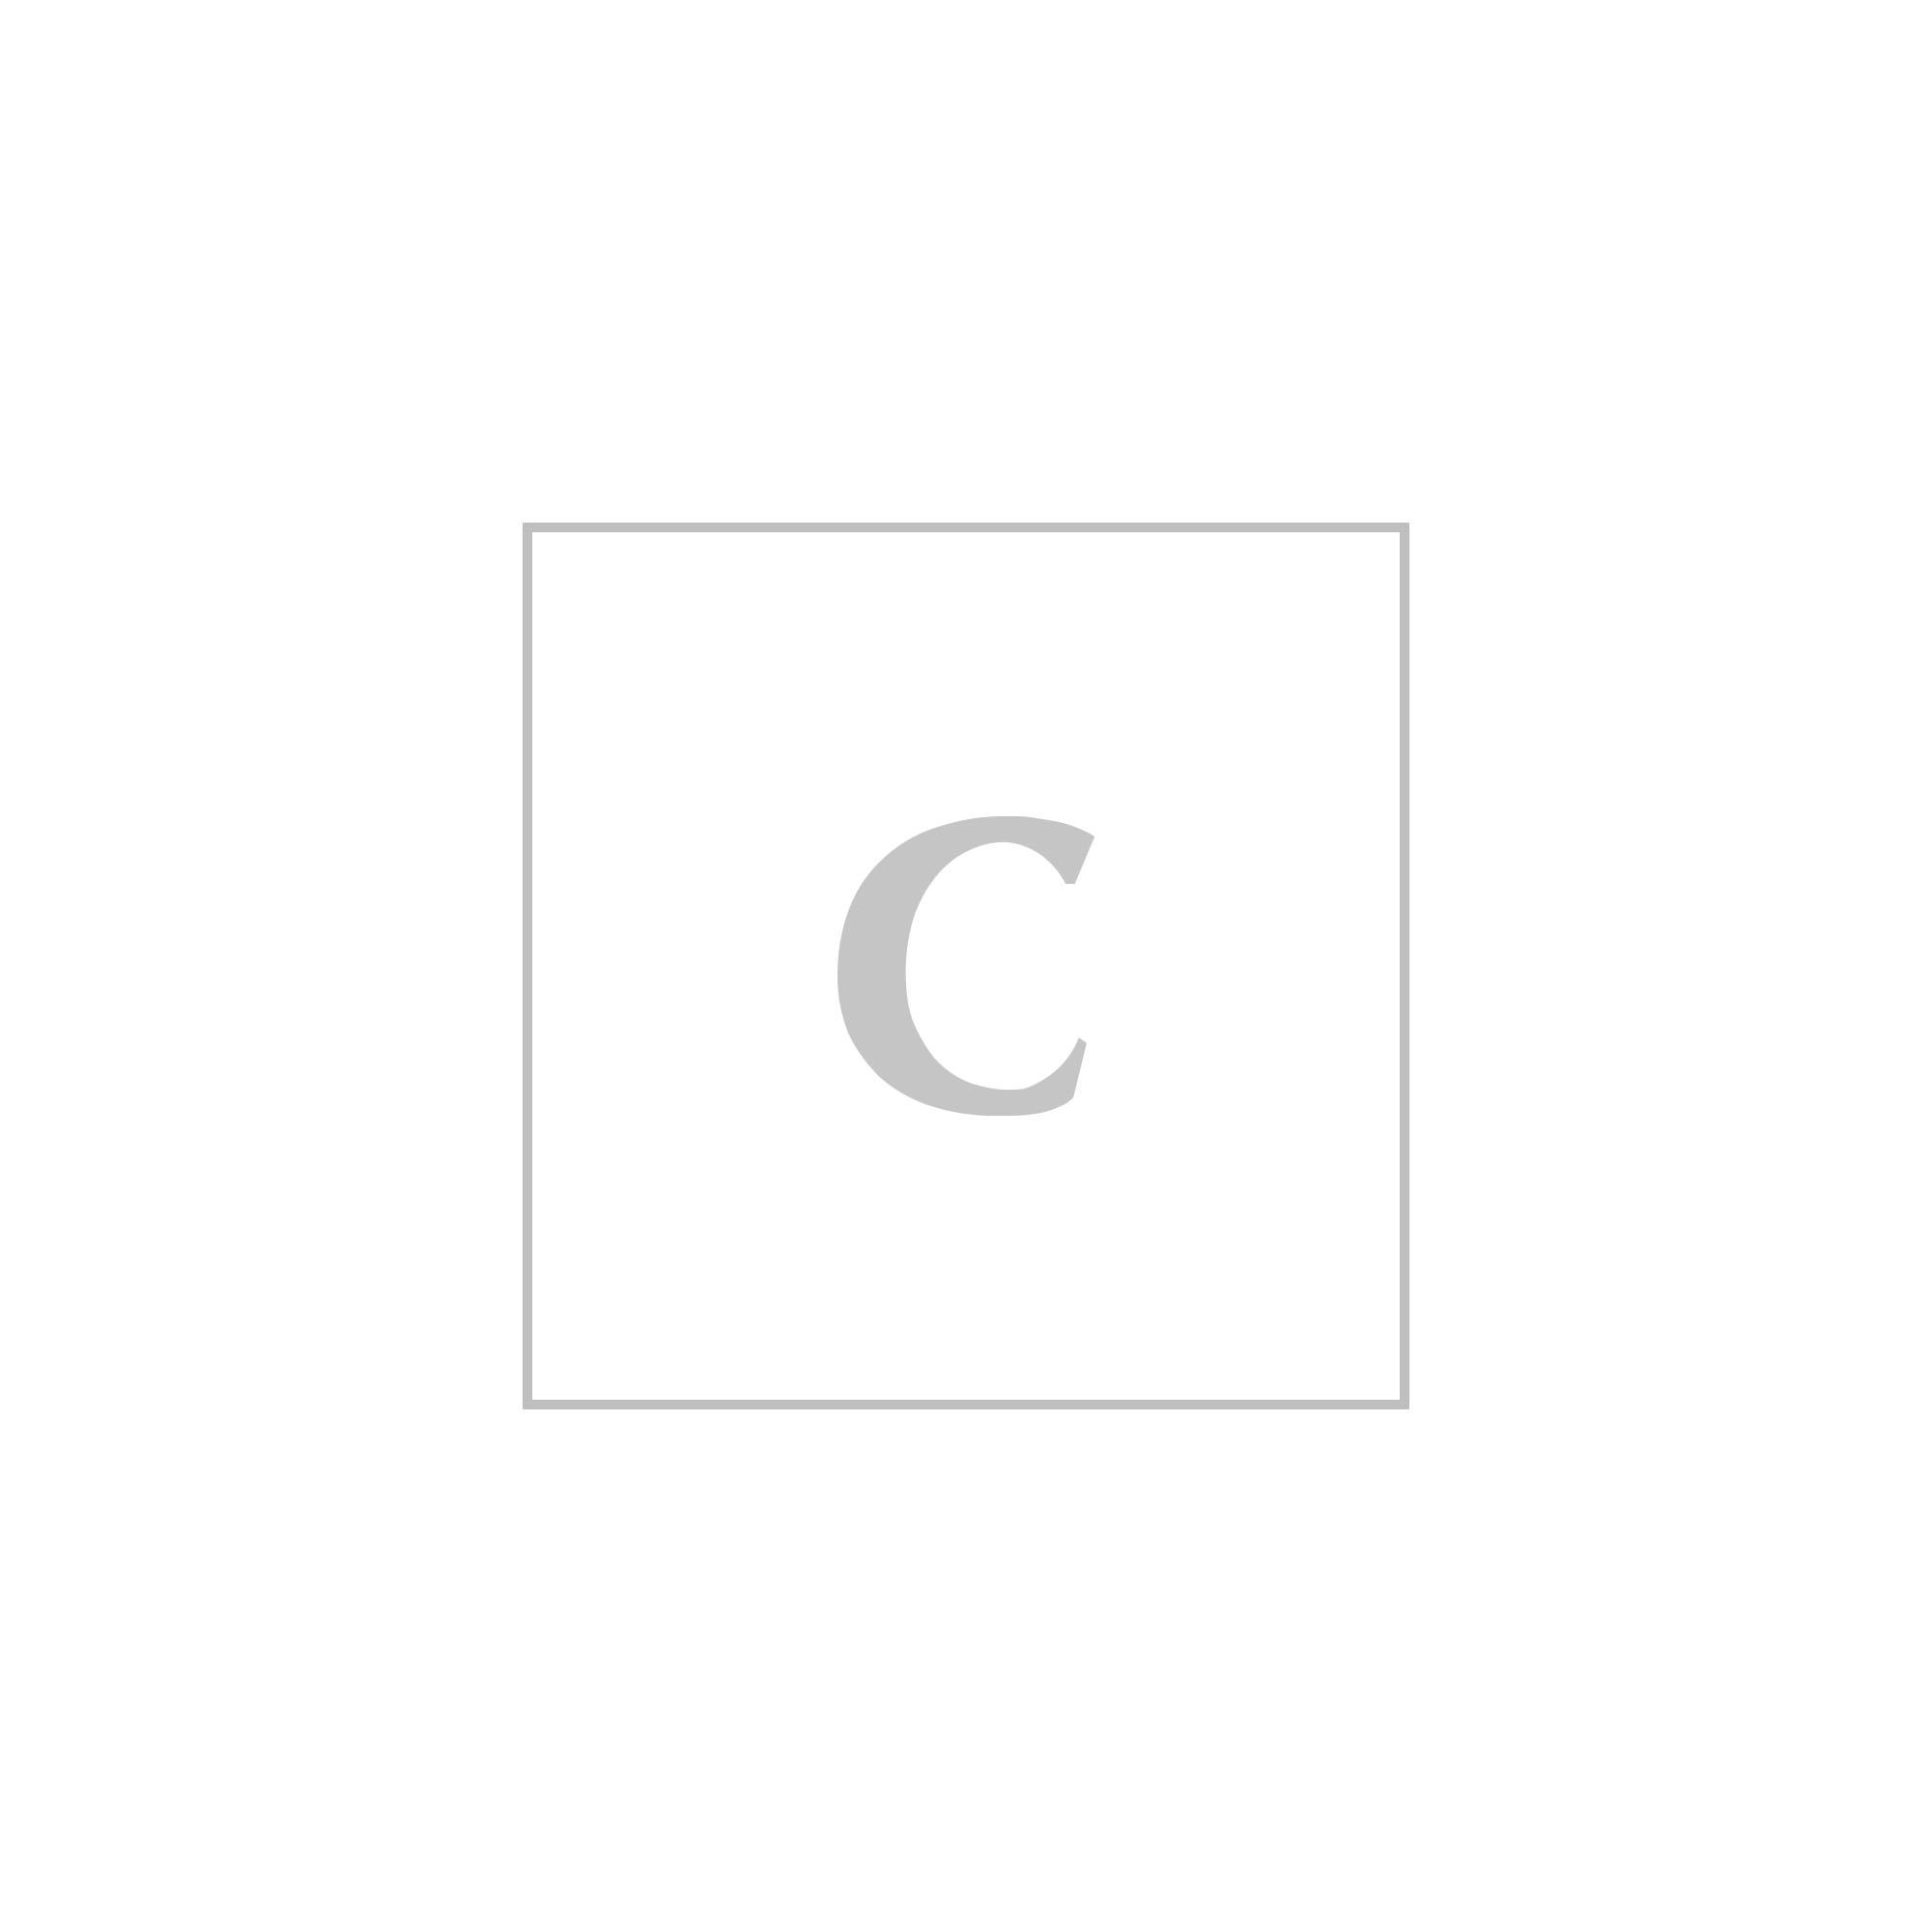 Dolce & gabbana sandali stampa iguana stromboli